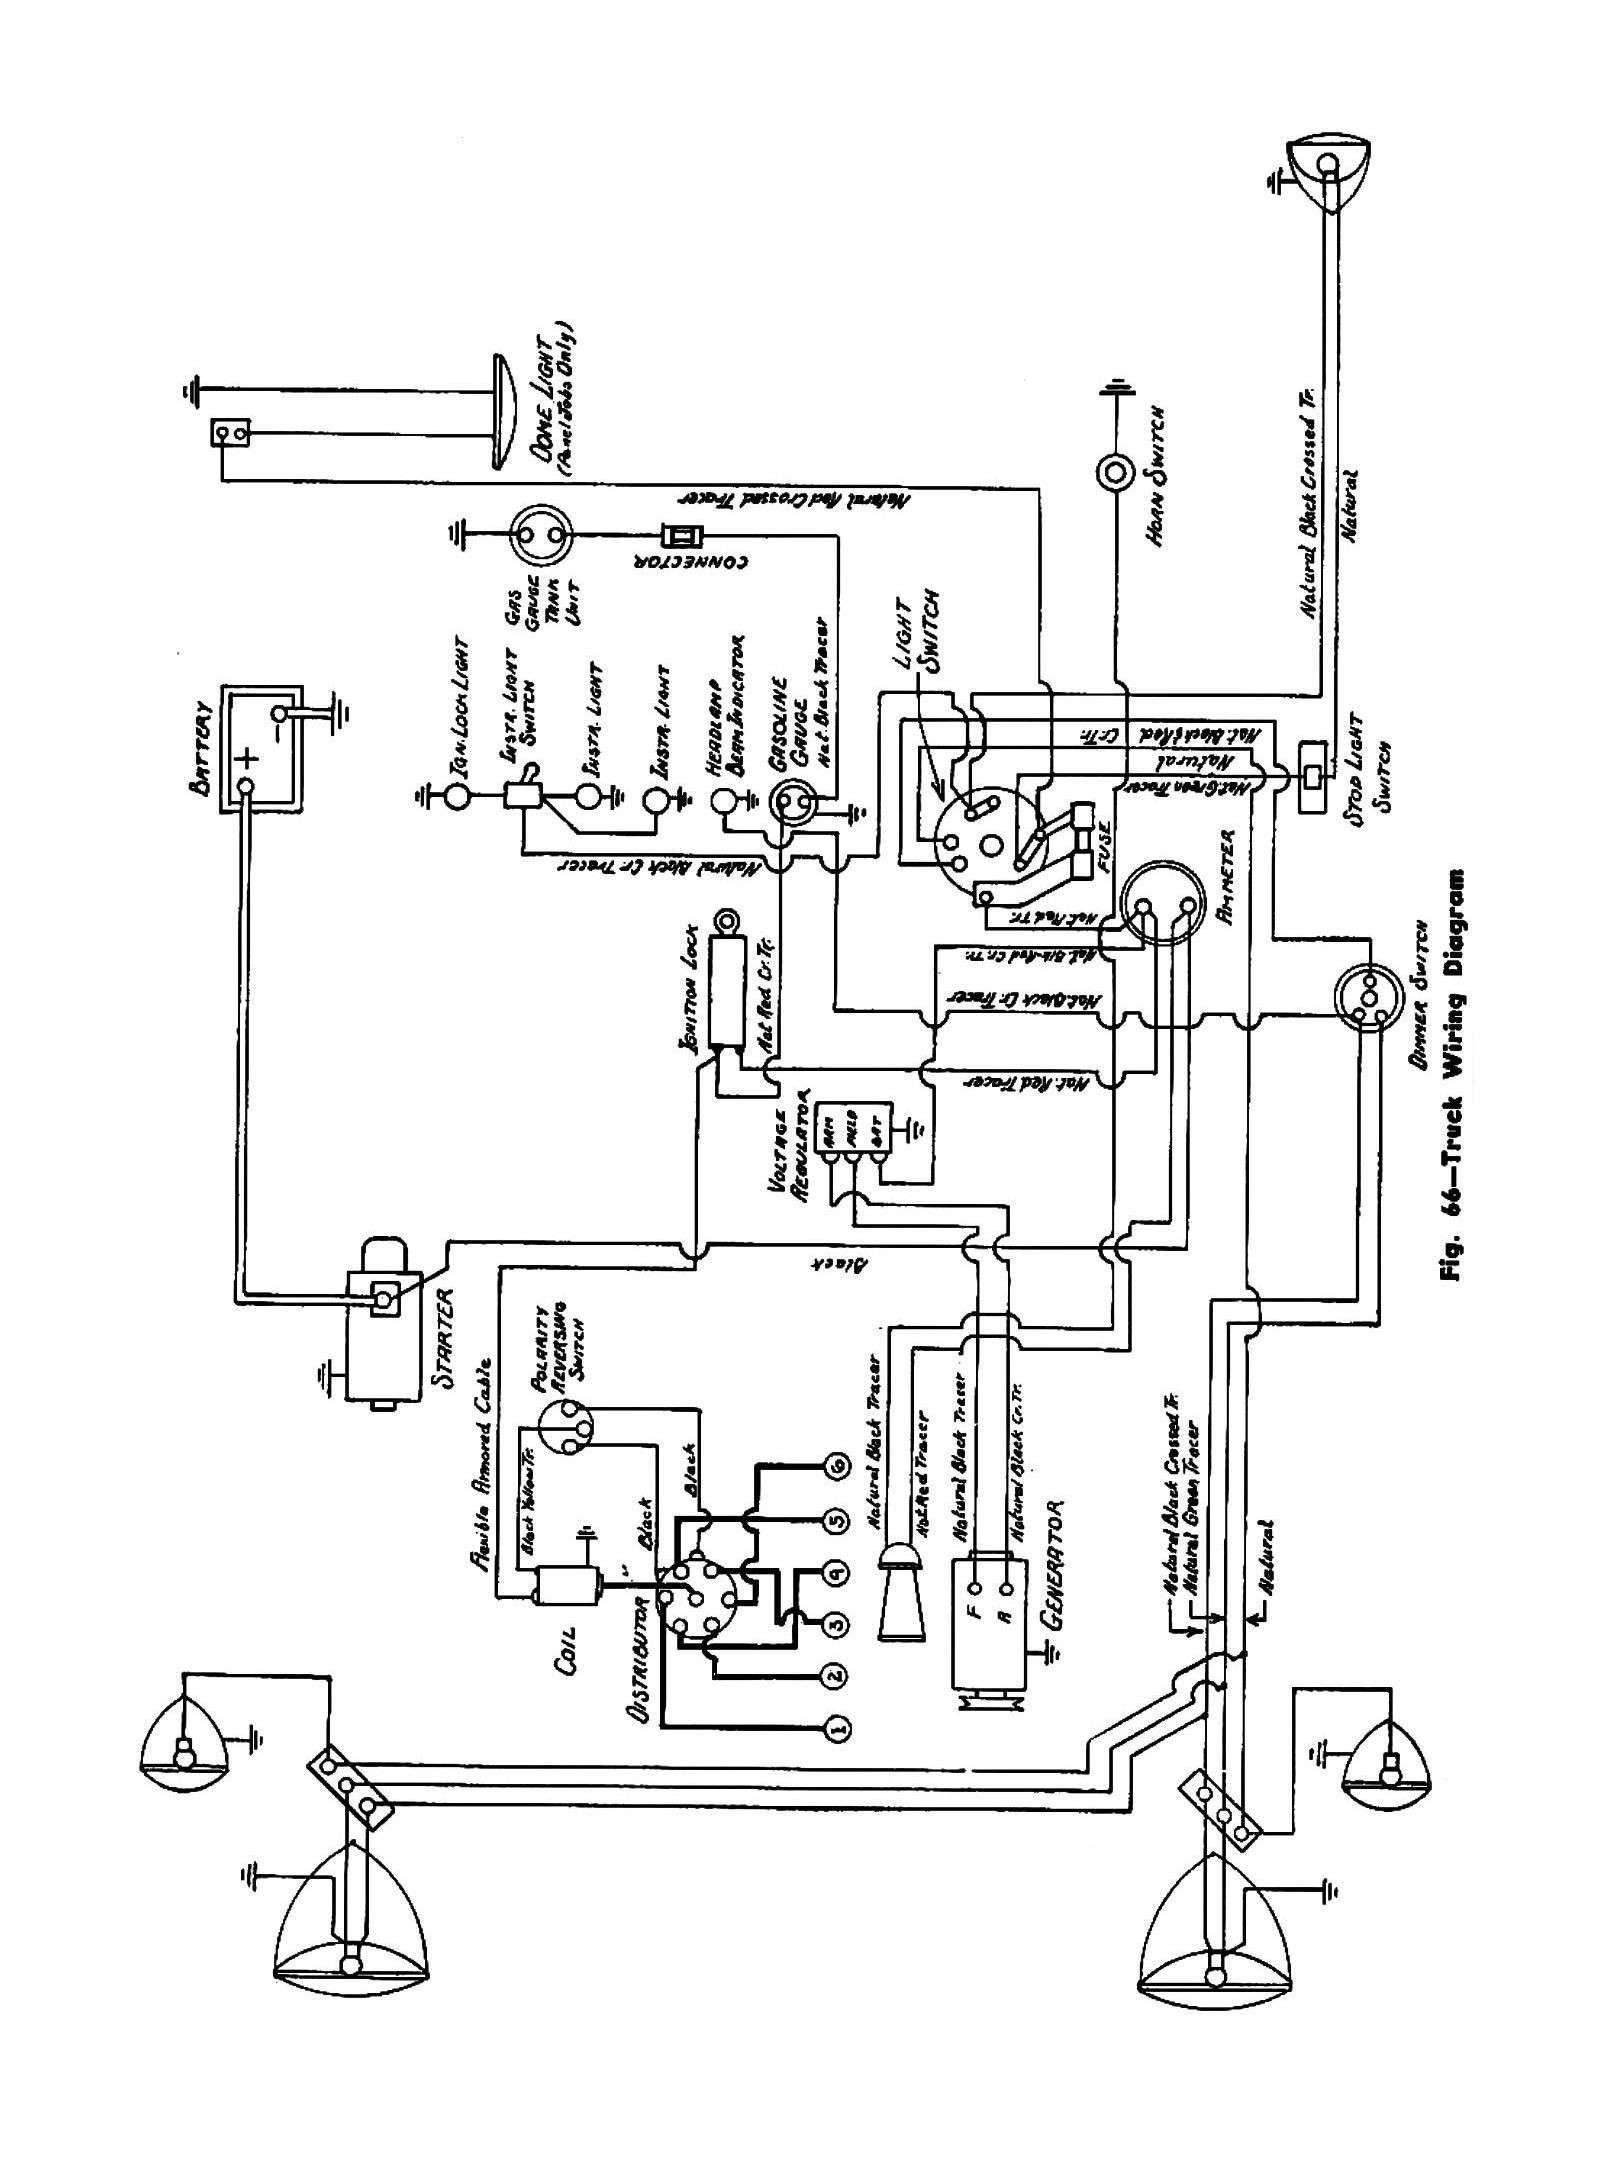 [DIAGRAM_5FD]  Wiring Diagram Cars Trucks. Wiring Diagram Cars Trucks. Truck Horn Wiring  Wiring Diagrams | 57 chevy trucks, Chevy trucks, 1946 chevy truck | Horns For Truck Wiring Diagrams |  | Pinterest